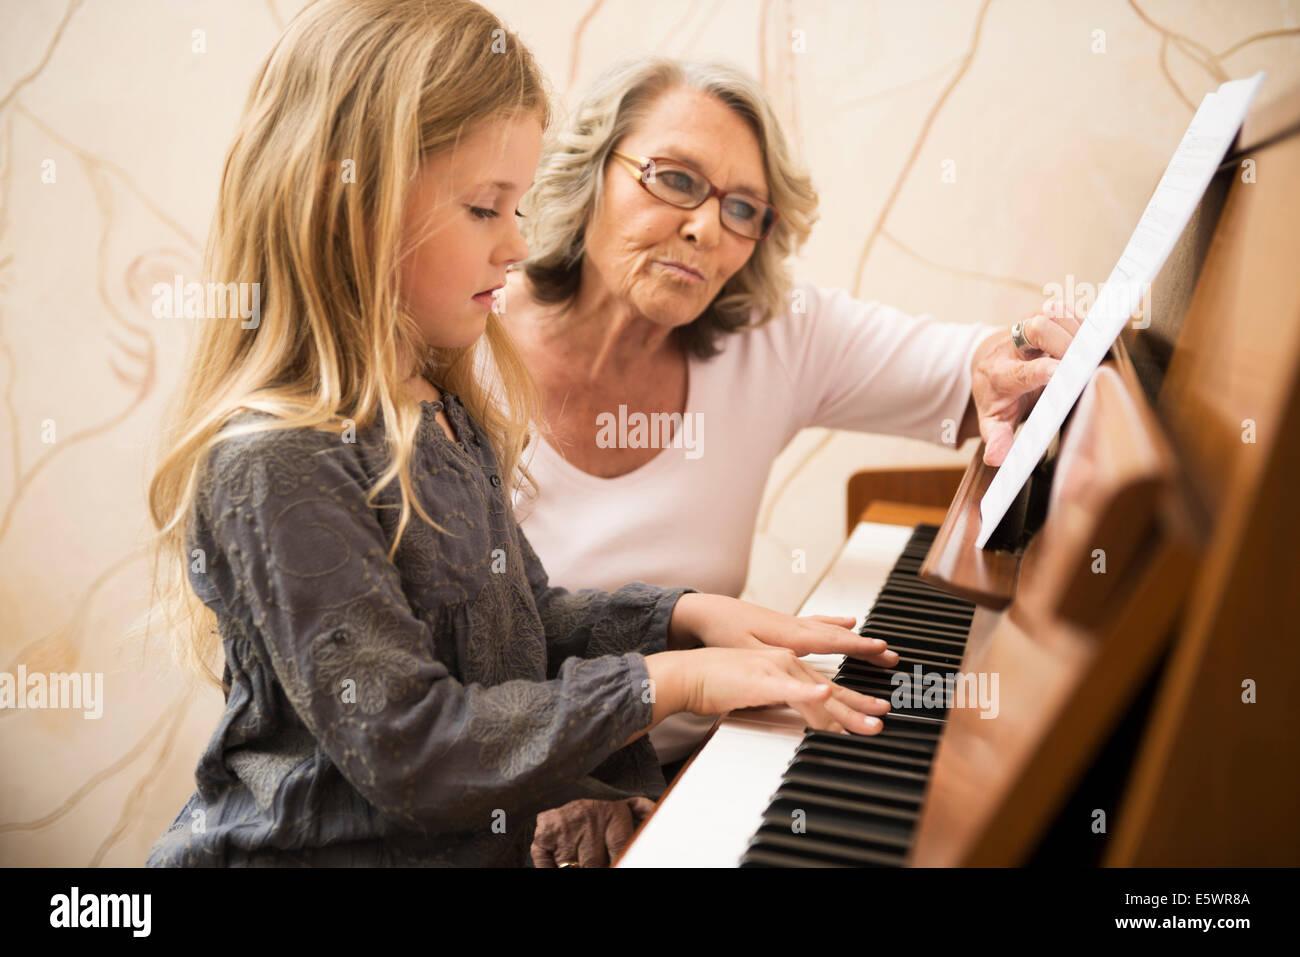 Abuela nieta enseñando piano Imagen De Stock